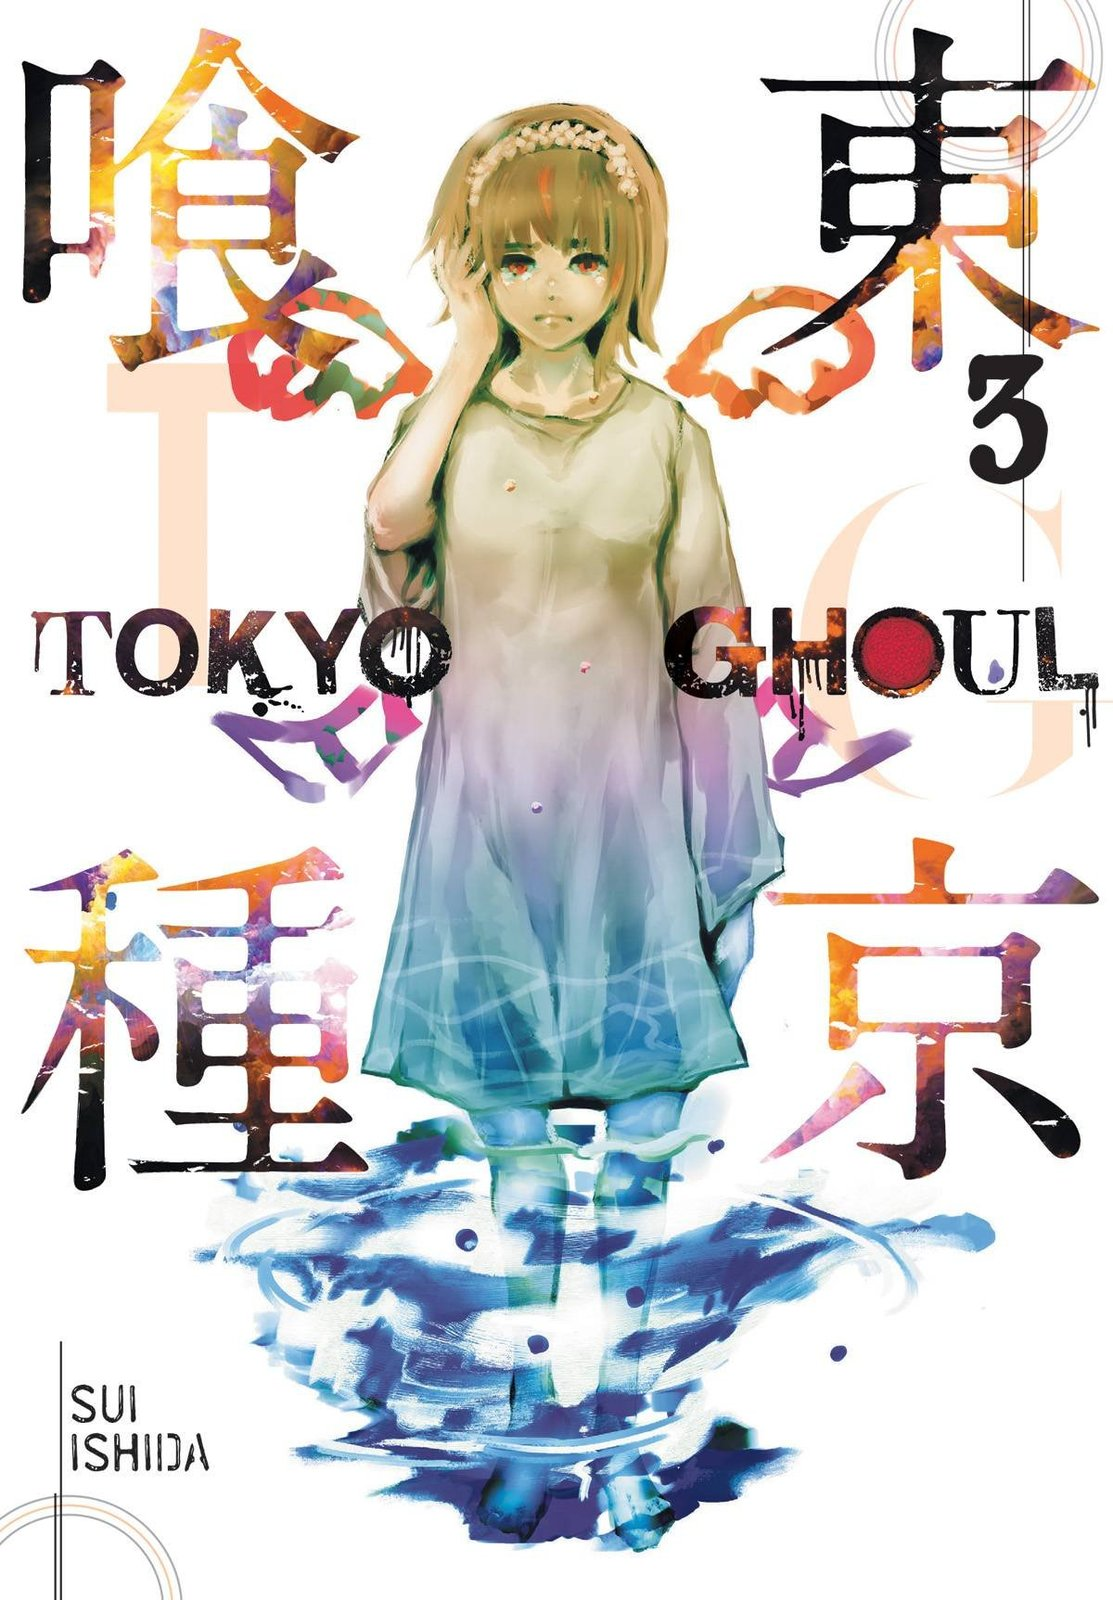 Tokyo Ghoul, Vol. 3 by Sui Ishida image